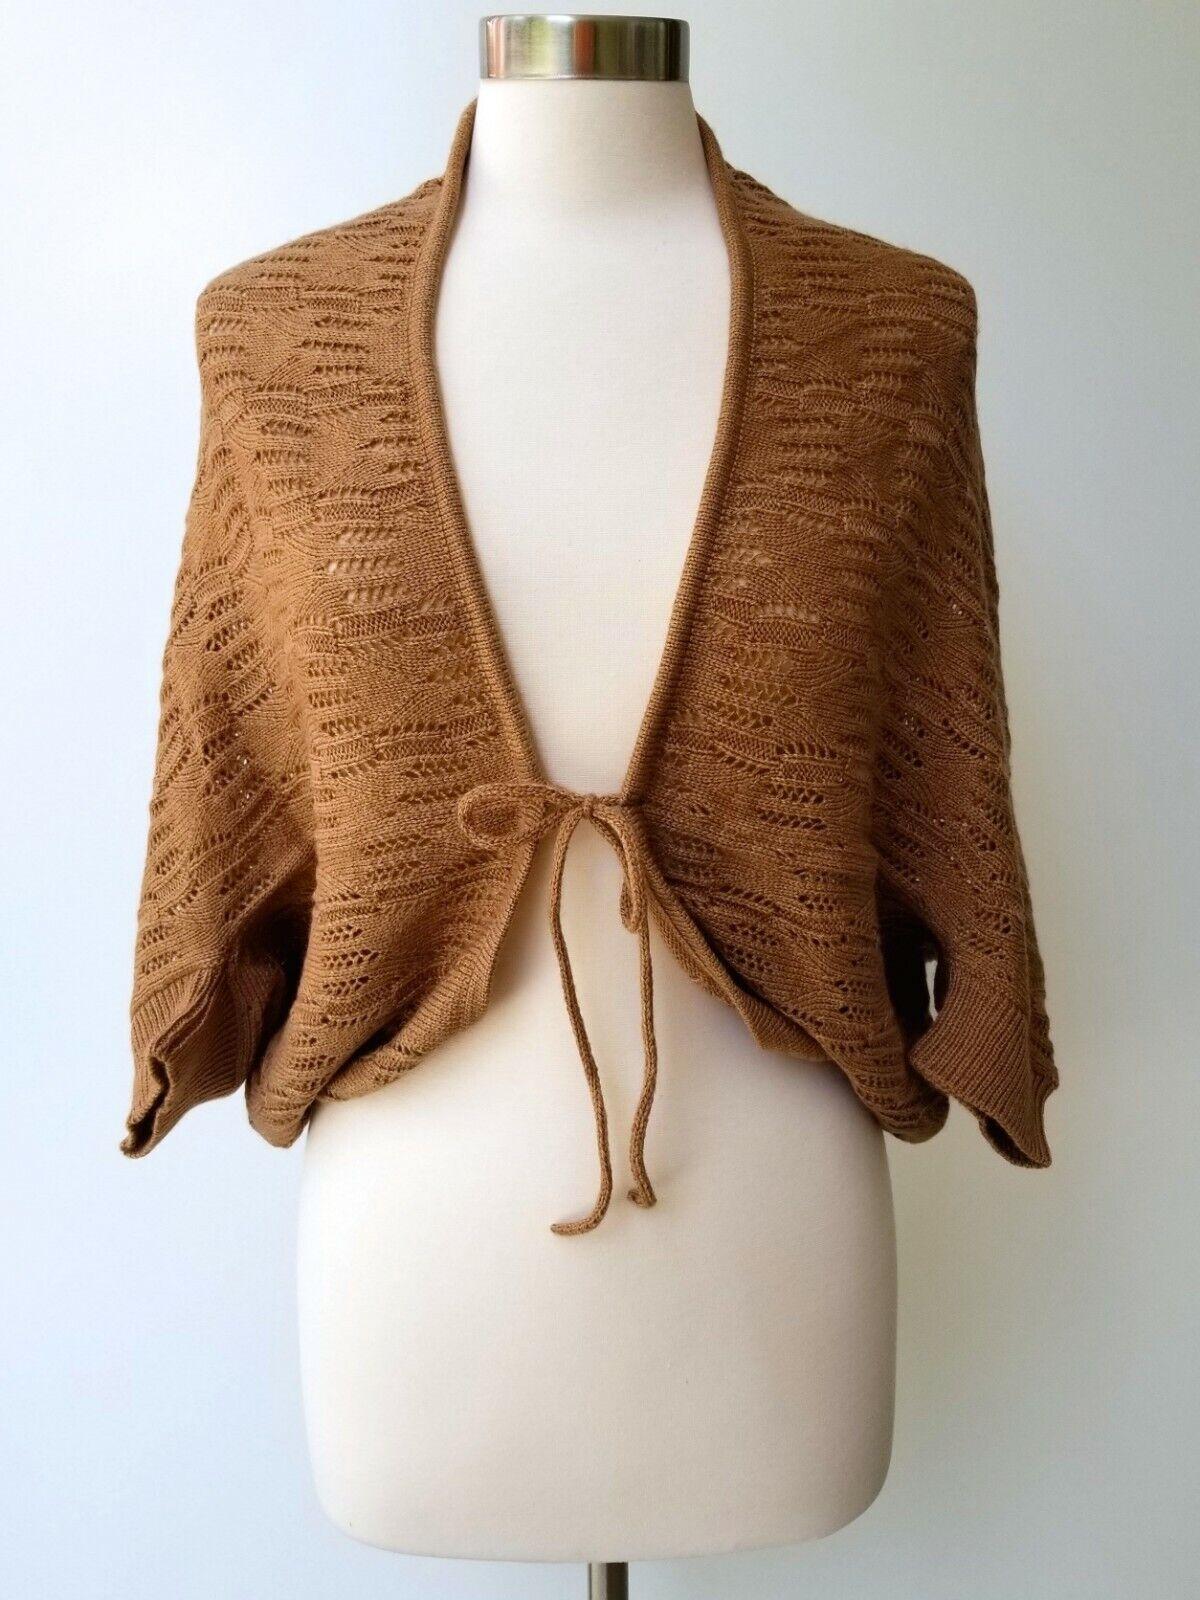 Alpaca Woven Sweater Cardigan Shawl Shrug Tan Taupe Wholesale Lot Full Size Run